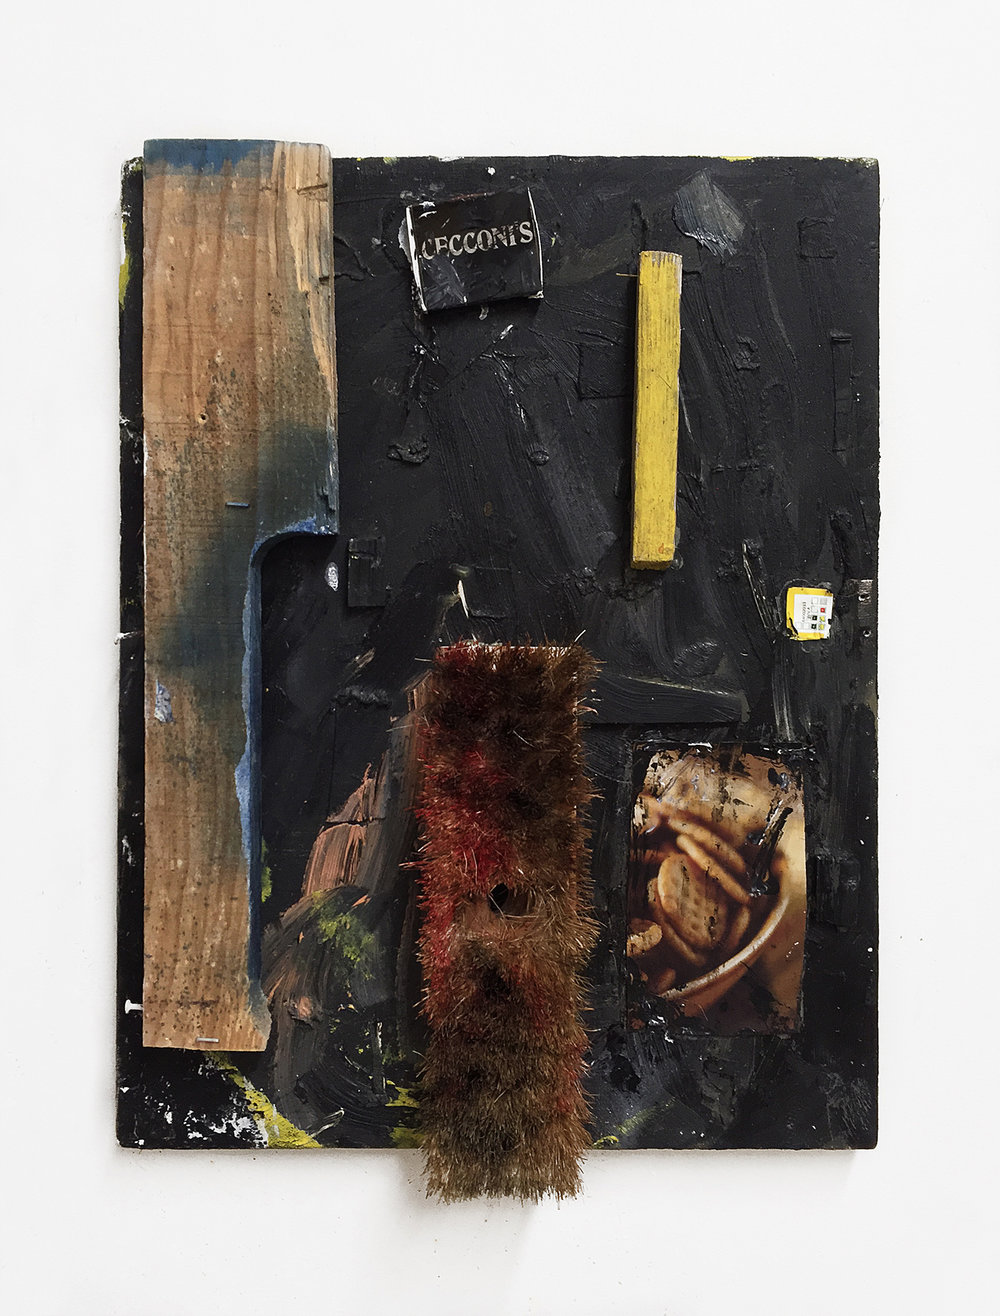 Untitled (Pull, Broom, Crackers) , 2018 Oil, wood, broom, matchbook, cardboard, cracker box, canvas 14in x 18in